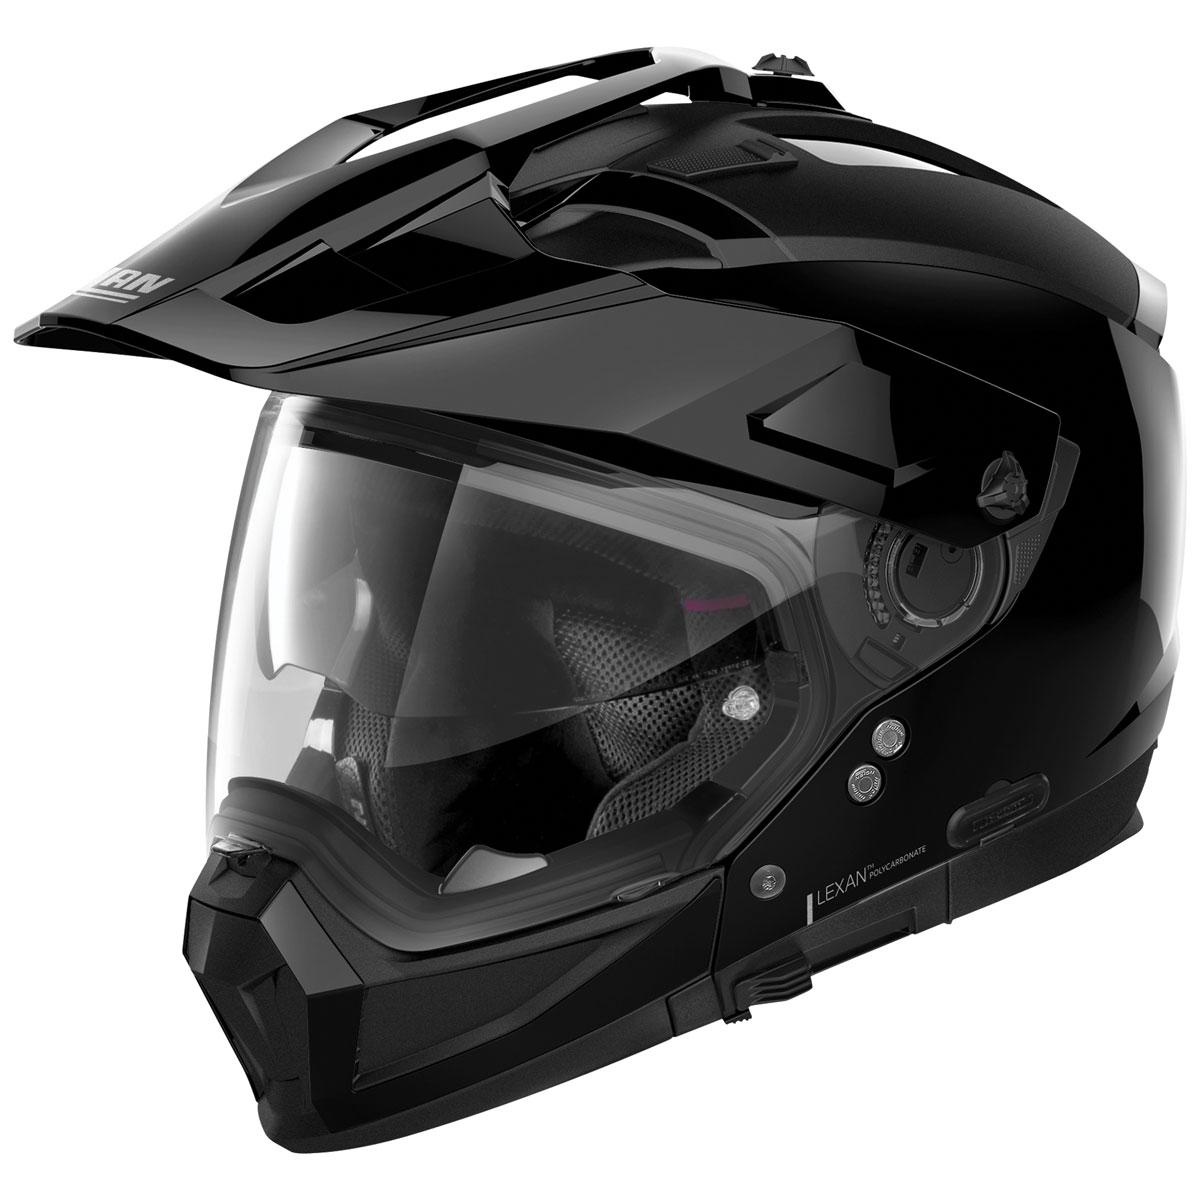 Nolan N70-2 X Gloss Black Dual Sport Helmet